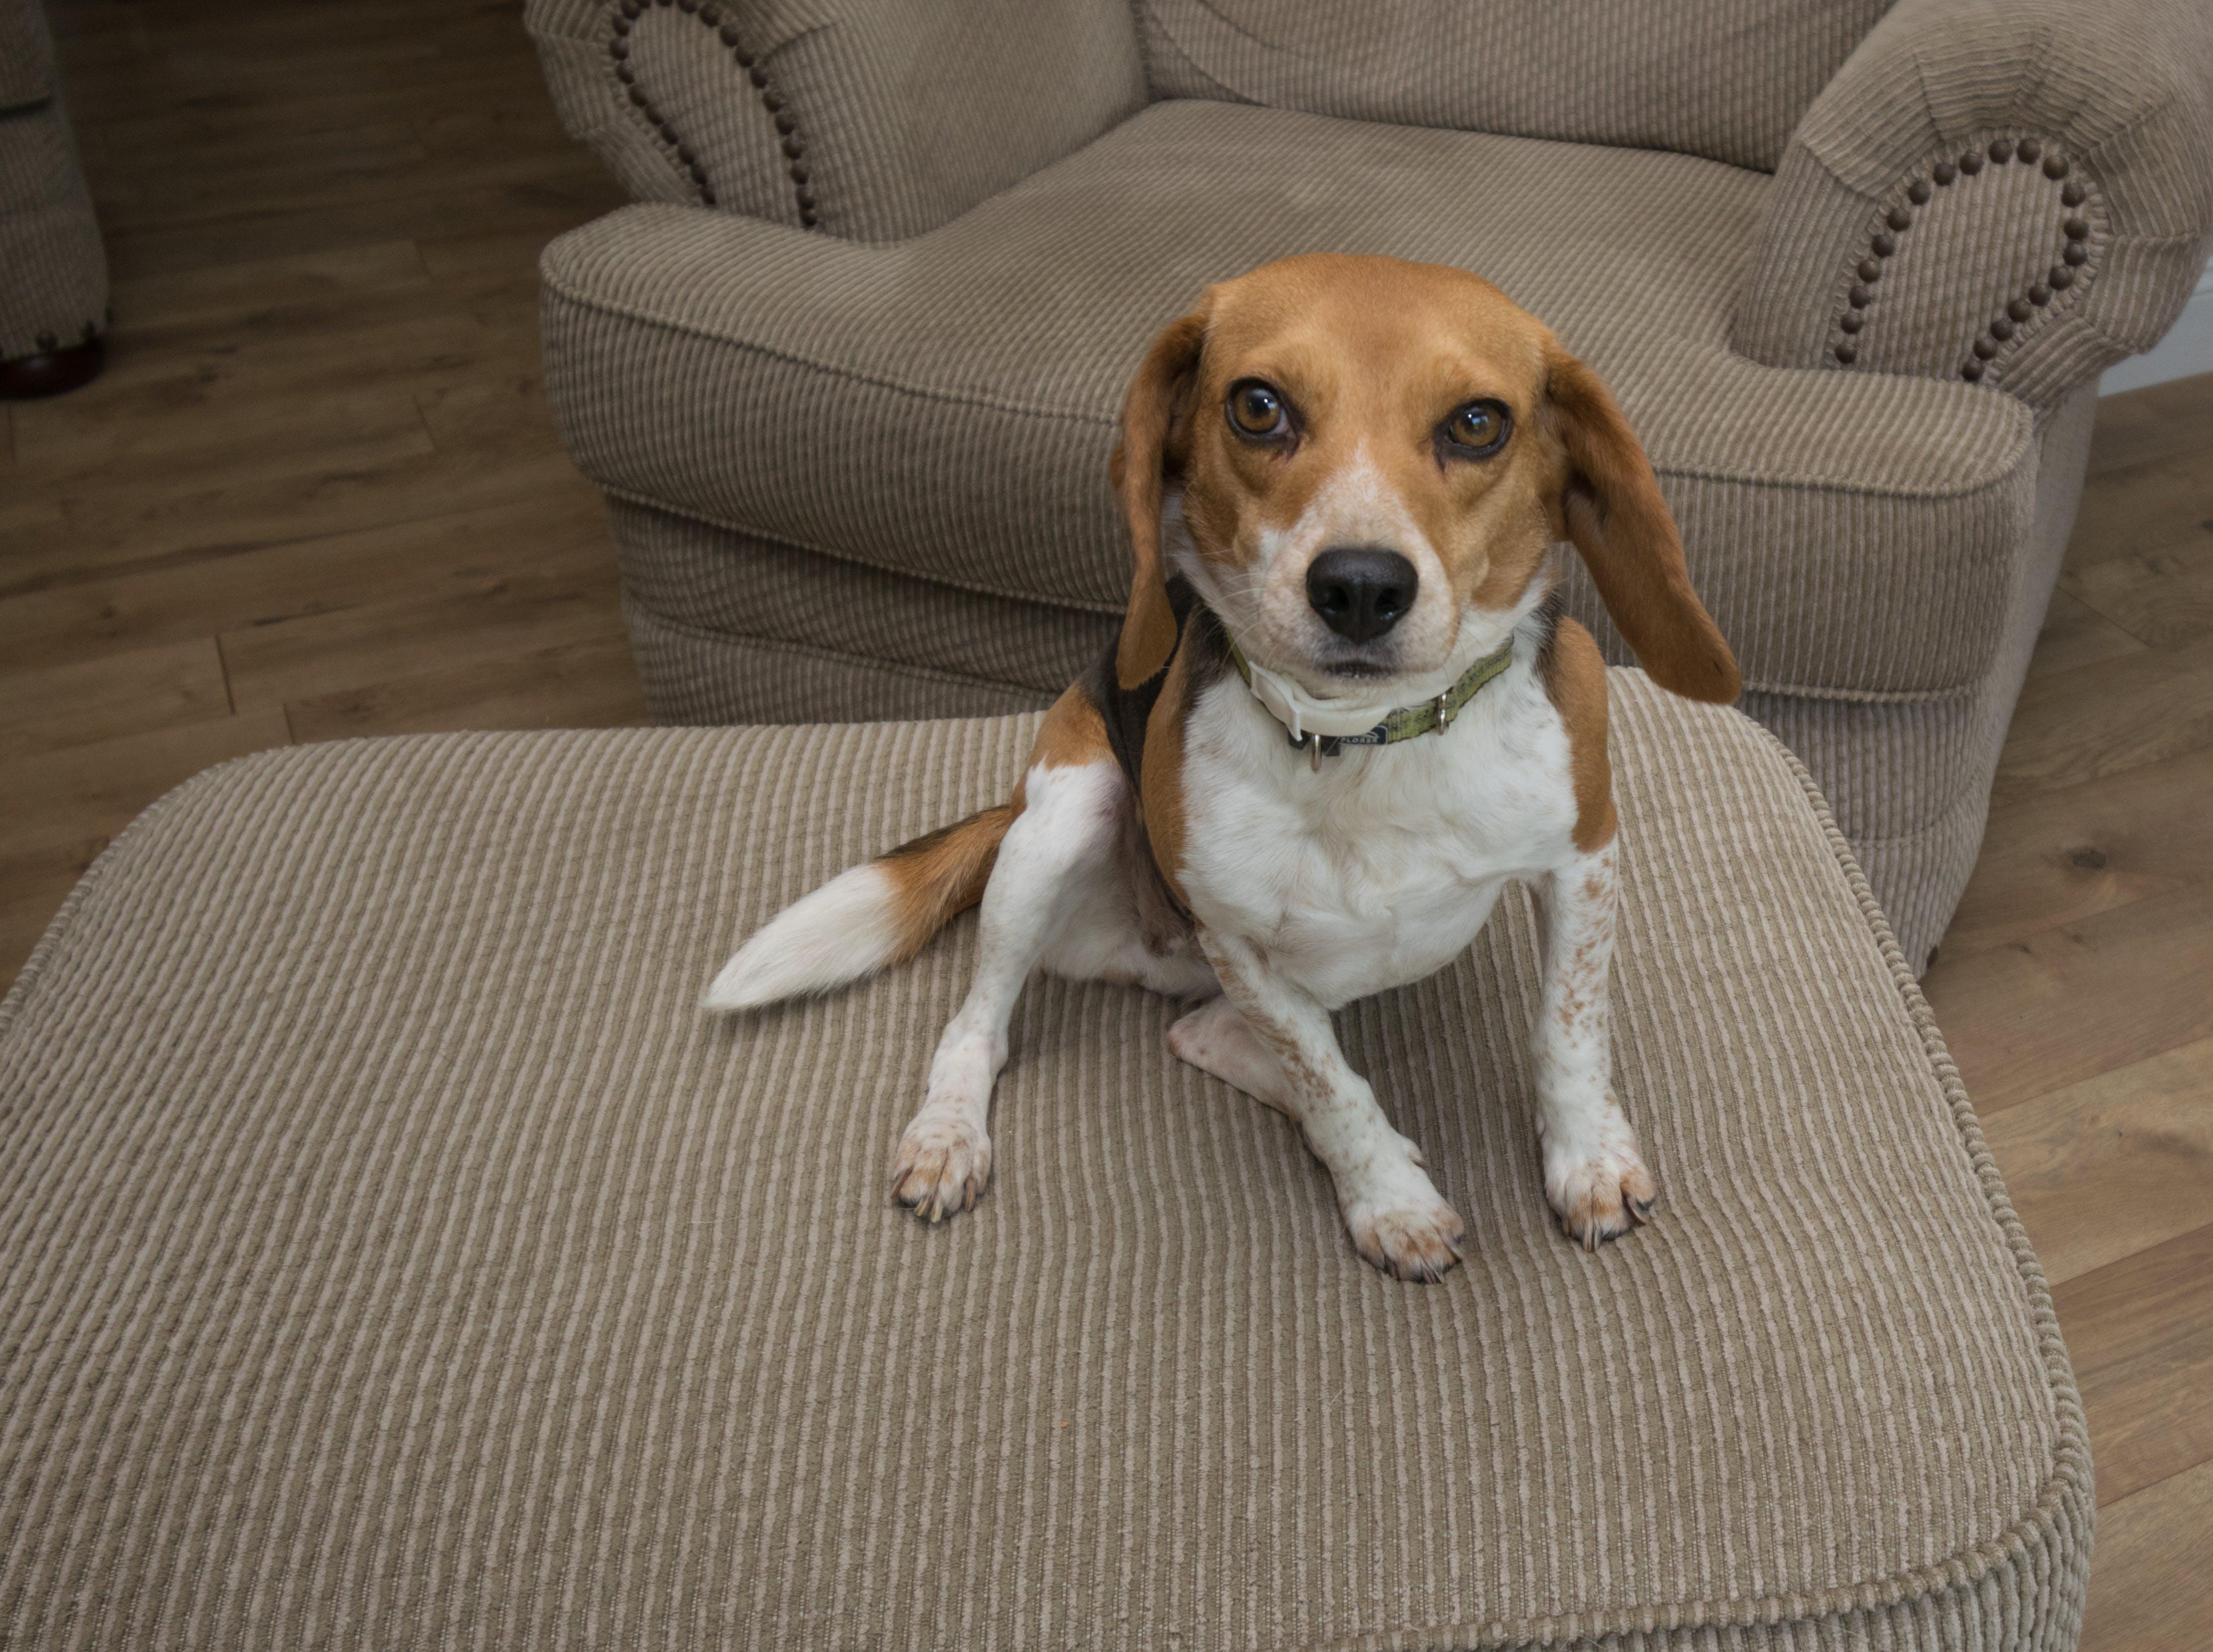 Free stock photo of animals, pets, home, beagle